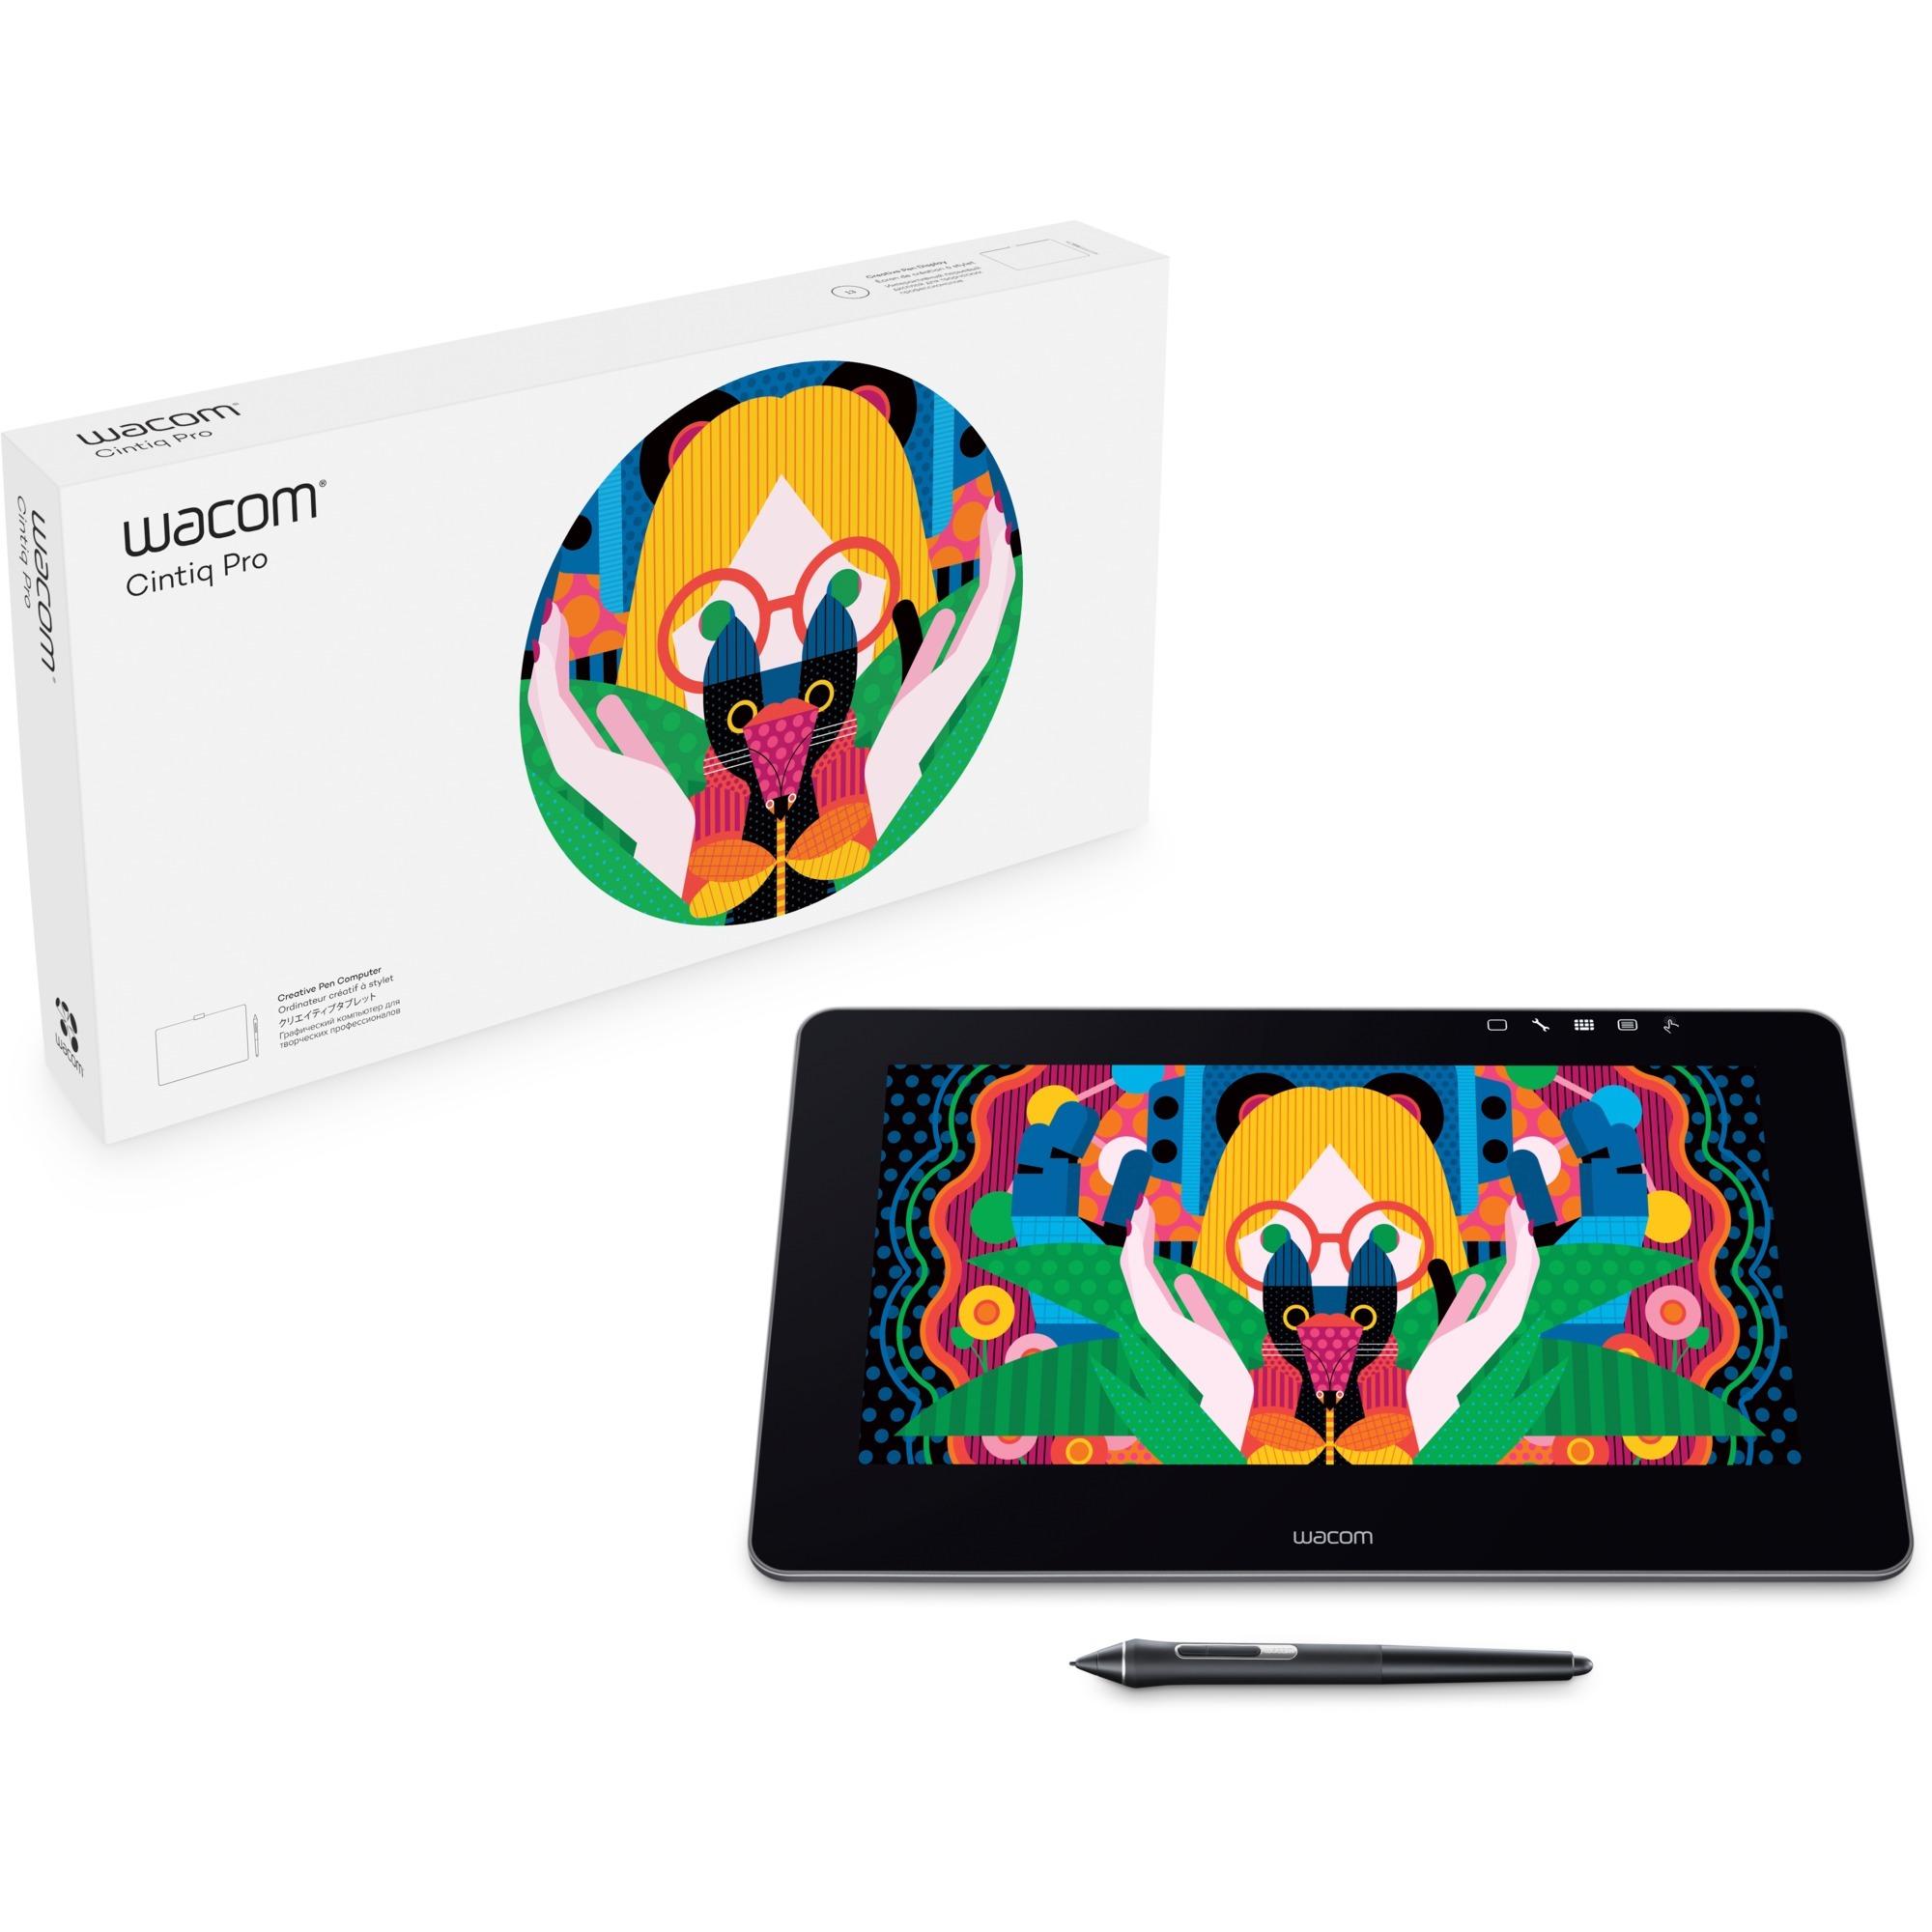 Cintiq Pro 13 tableta digitalizadora 5080 líneas por pulgada 294 x 166 mm USB Negro, Tableta gráfica